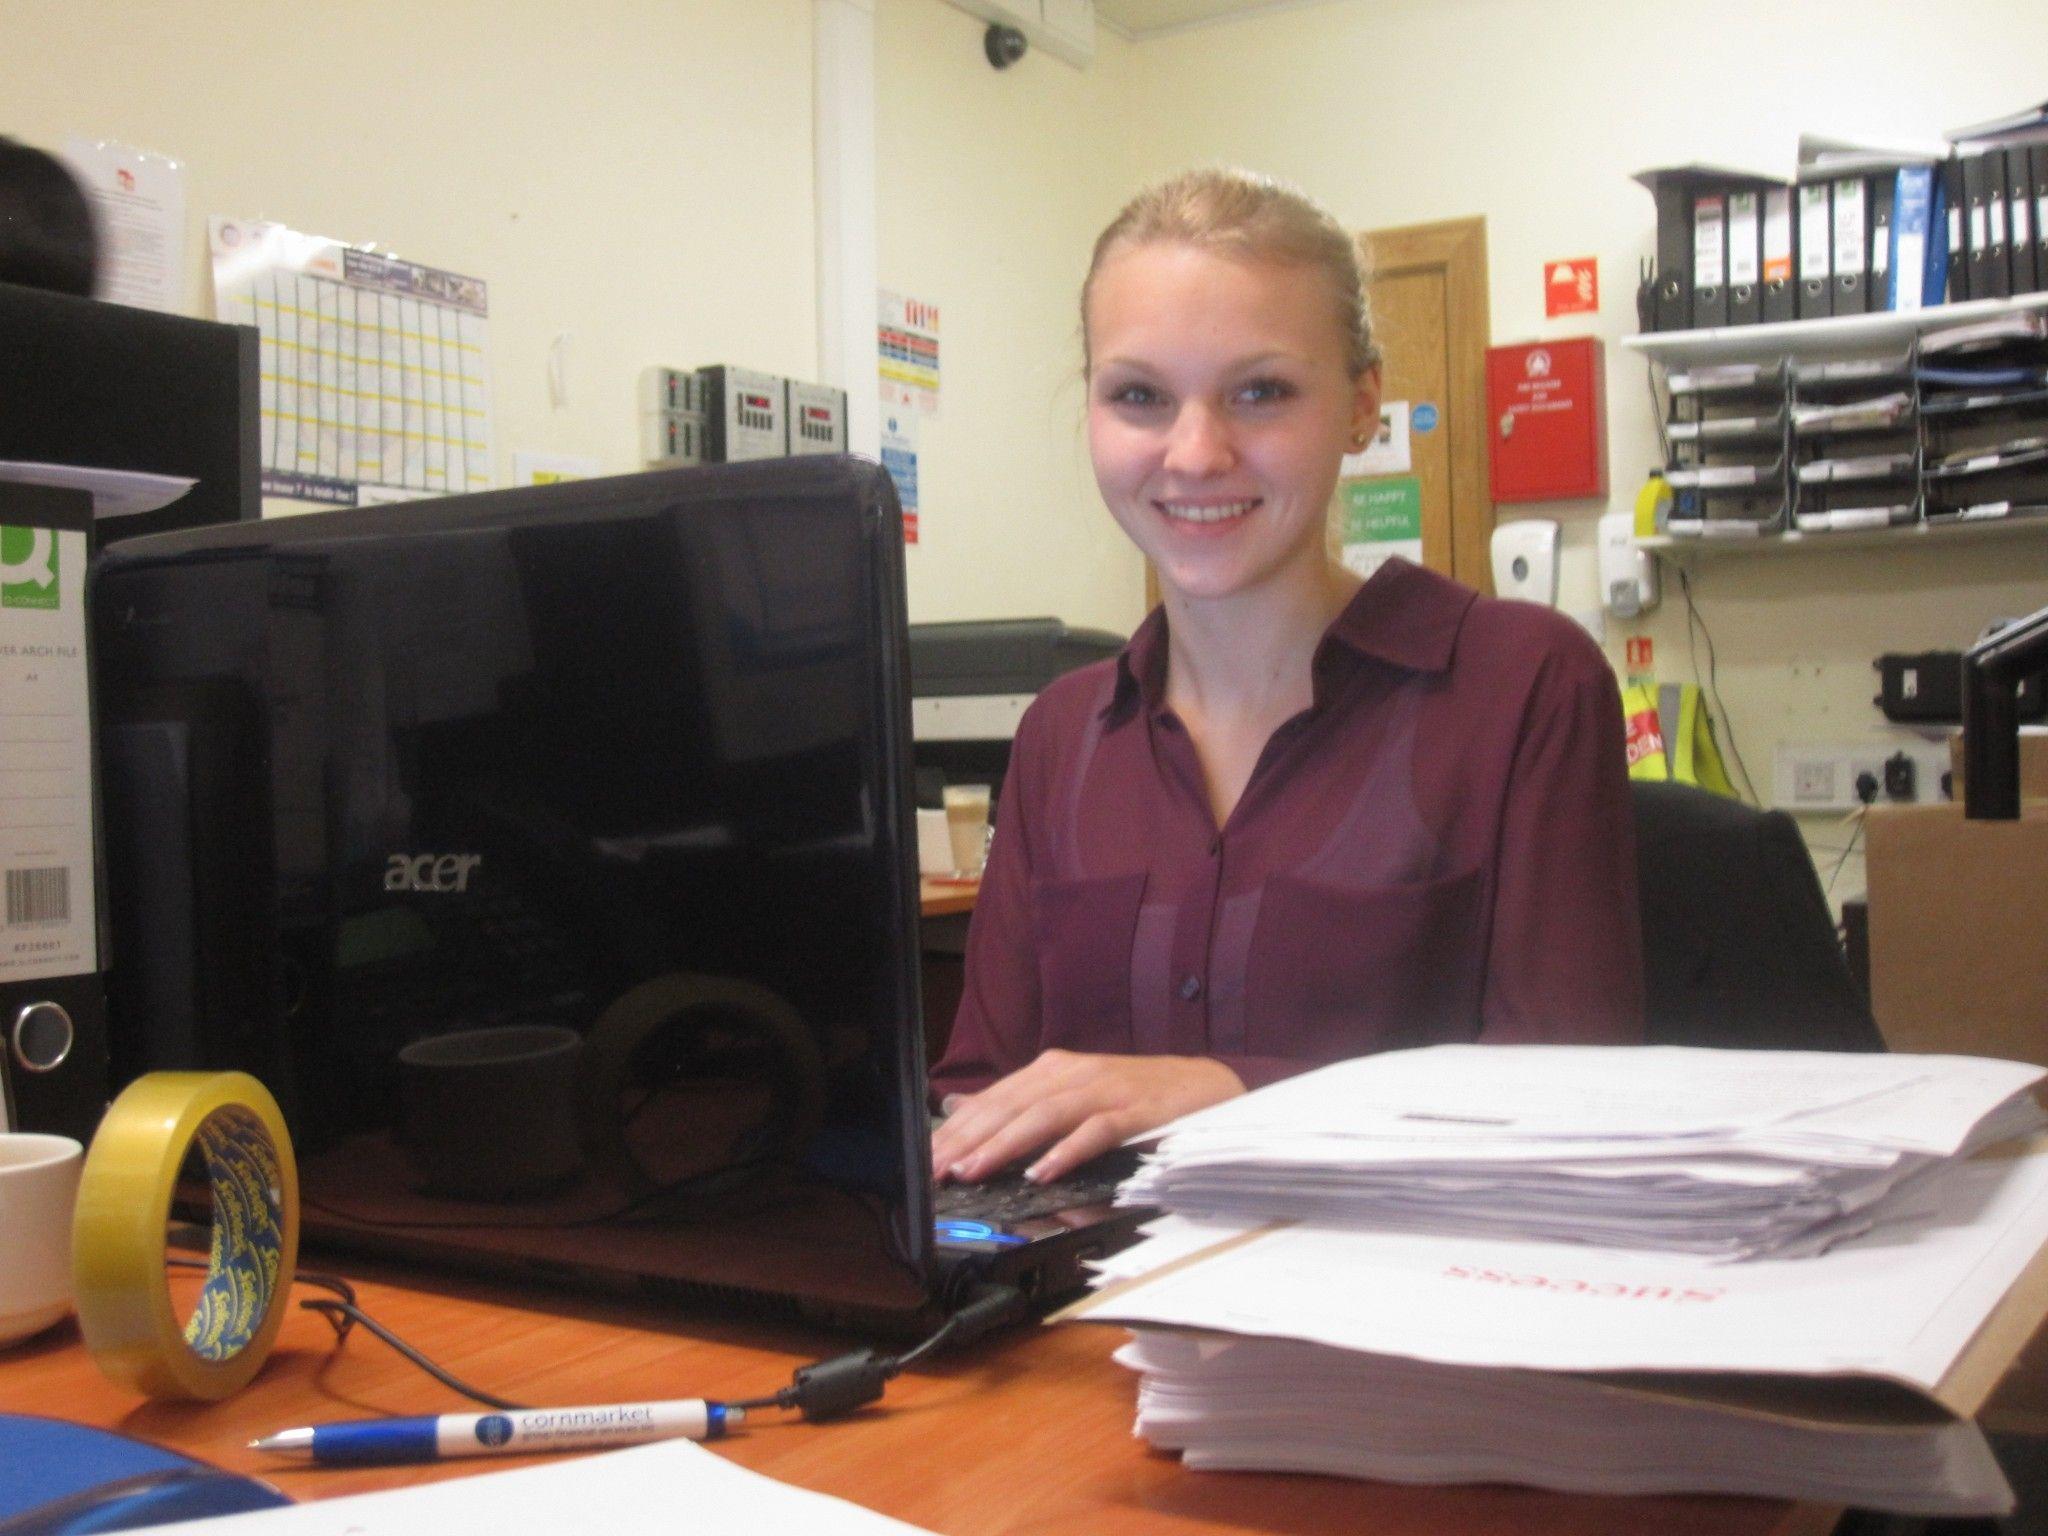 Anna-Lena at work